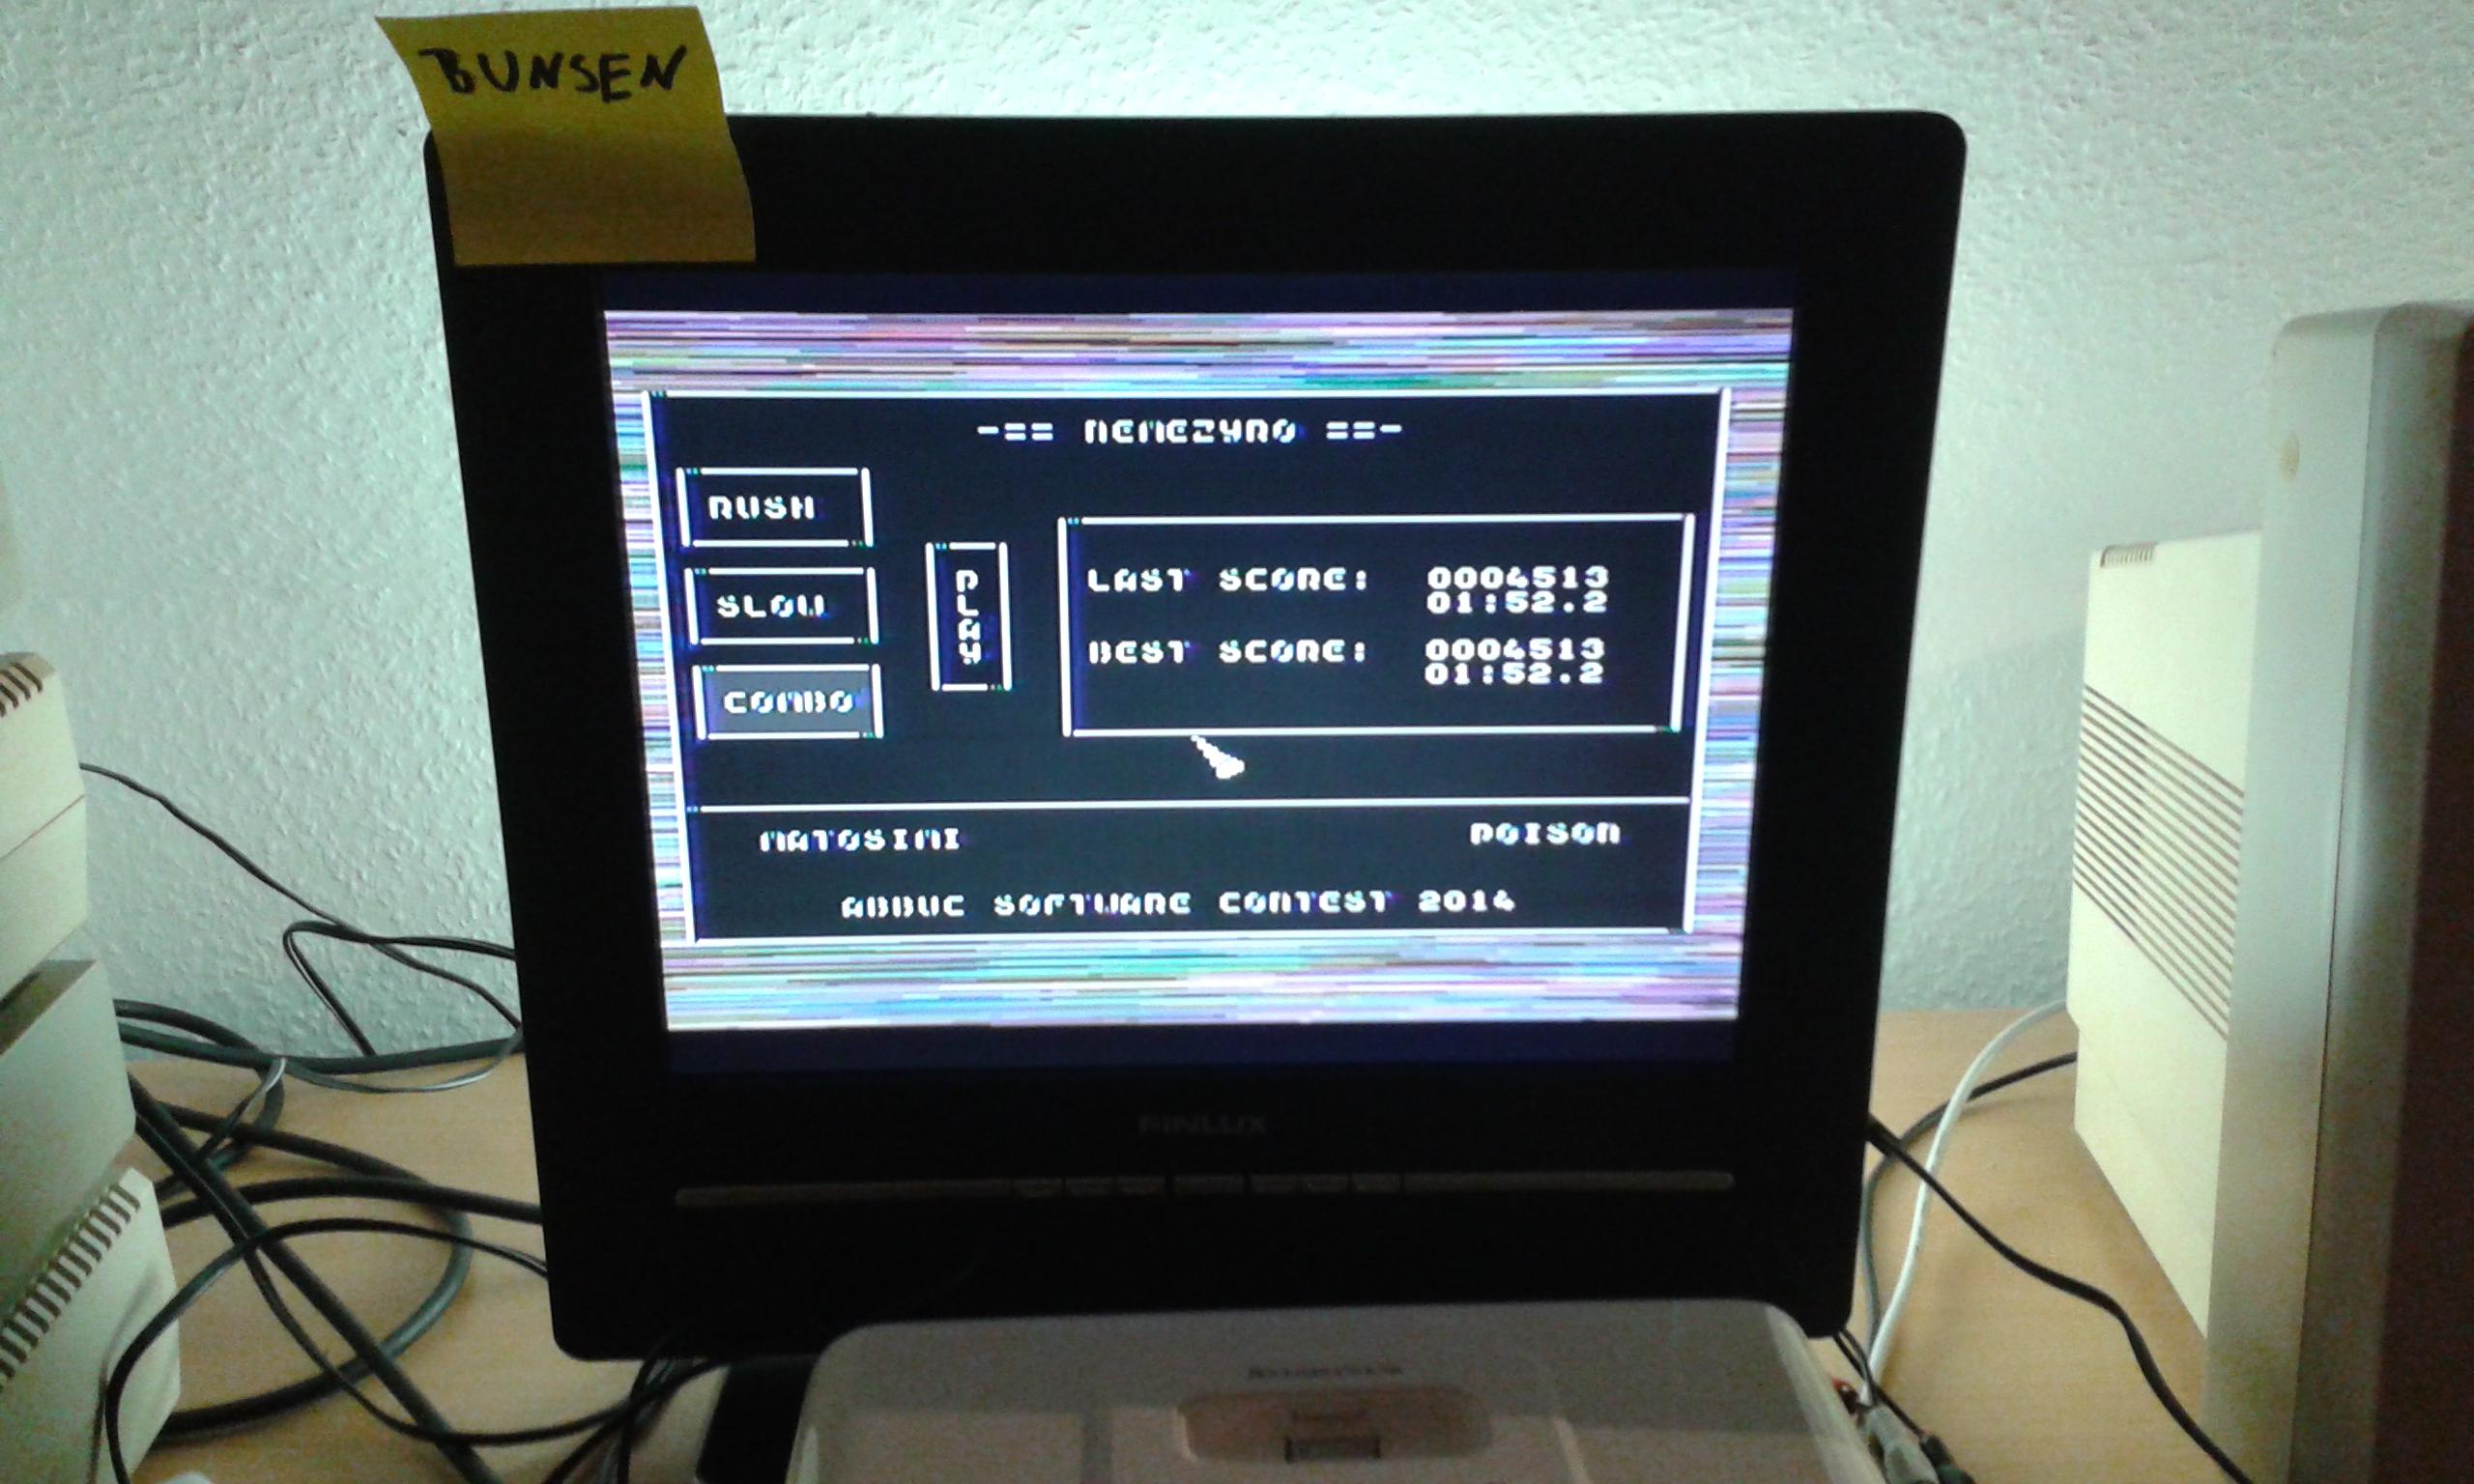 Bunsen: Nemezyro: Combo (Atari 400/800/XL/XE) 4,513 points on 2014-11-15 04:25:07